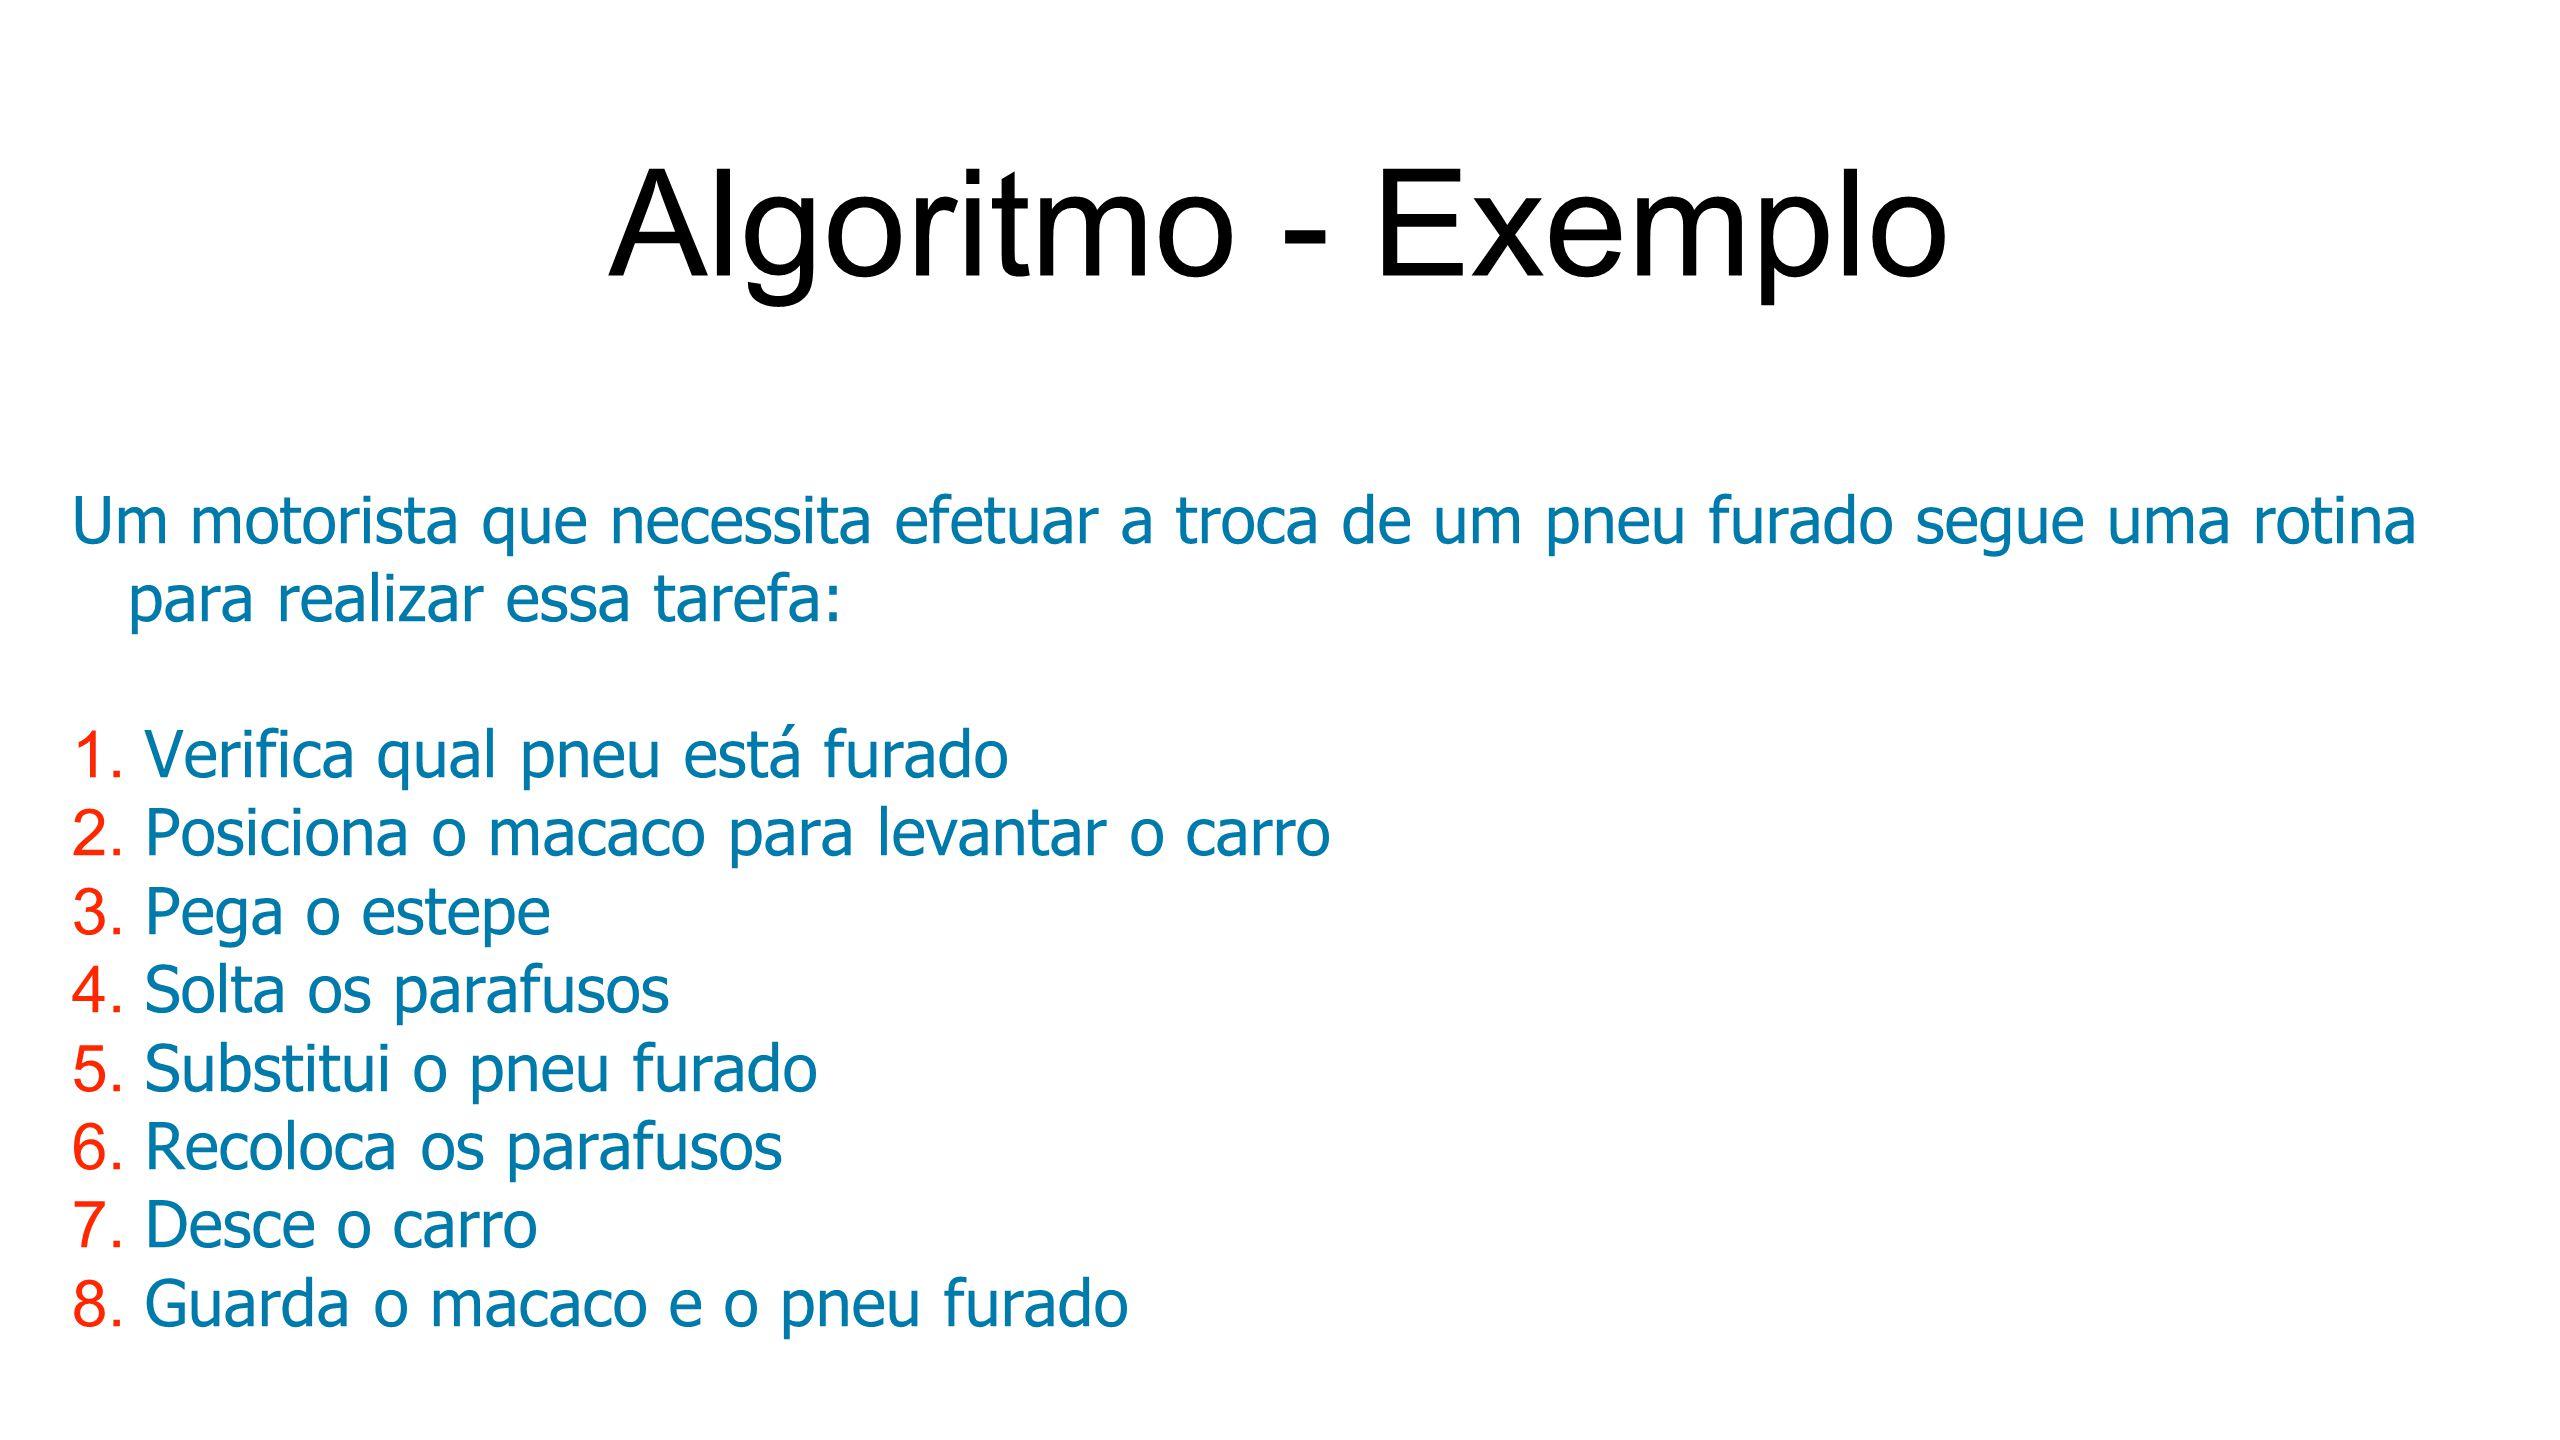 Exemplo Variável Lógica public static void main(String[] args) { boolean chovendo; chovendo = true; System.out.println(chovendo); chovendo = false; System.out.println(chovendo); }